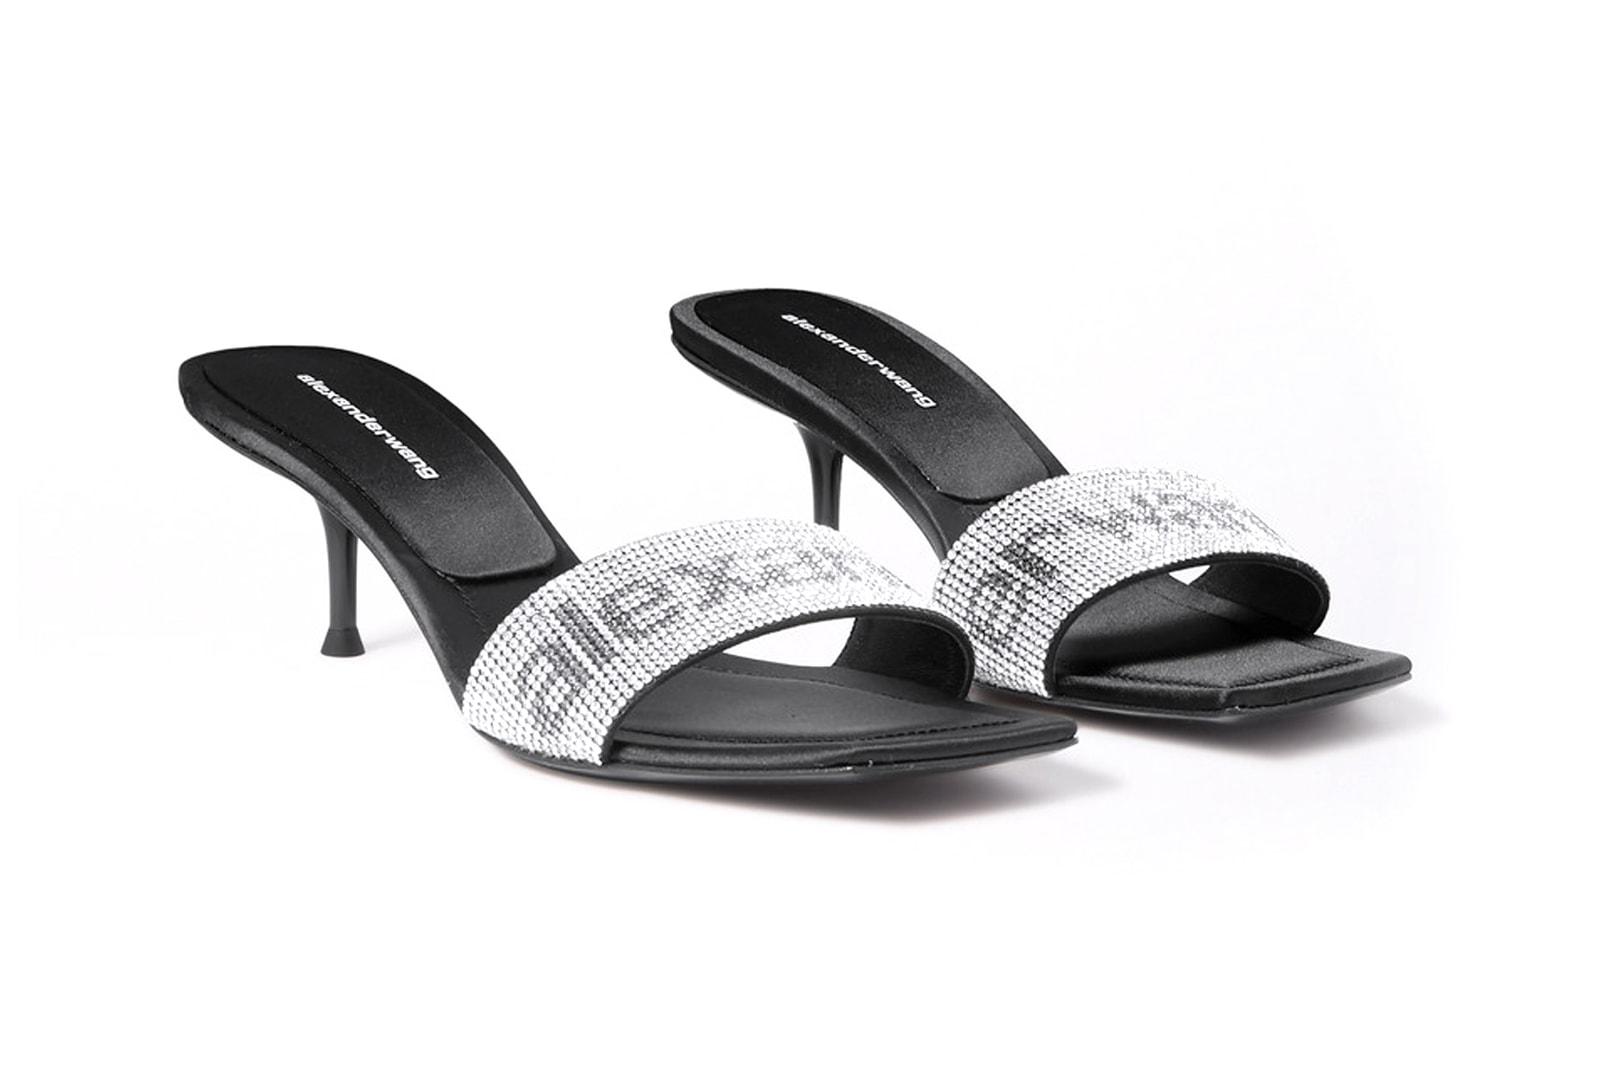 Square Toe Shoes Trend Sandals Heels Dior Oblique Vintage